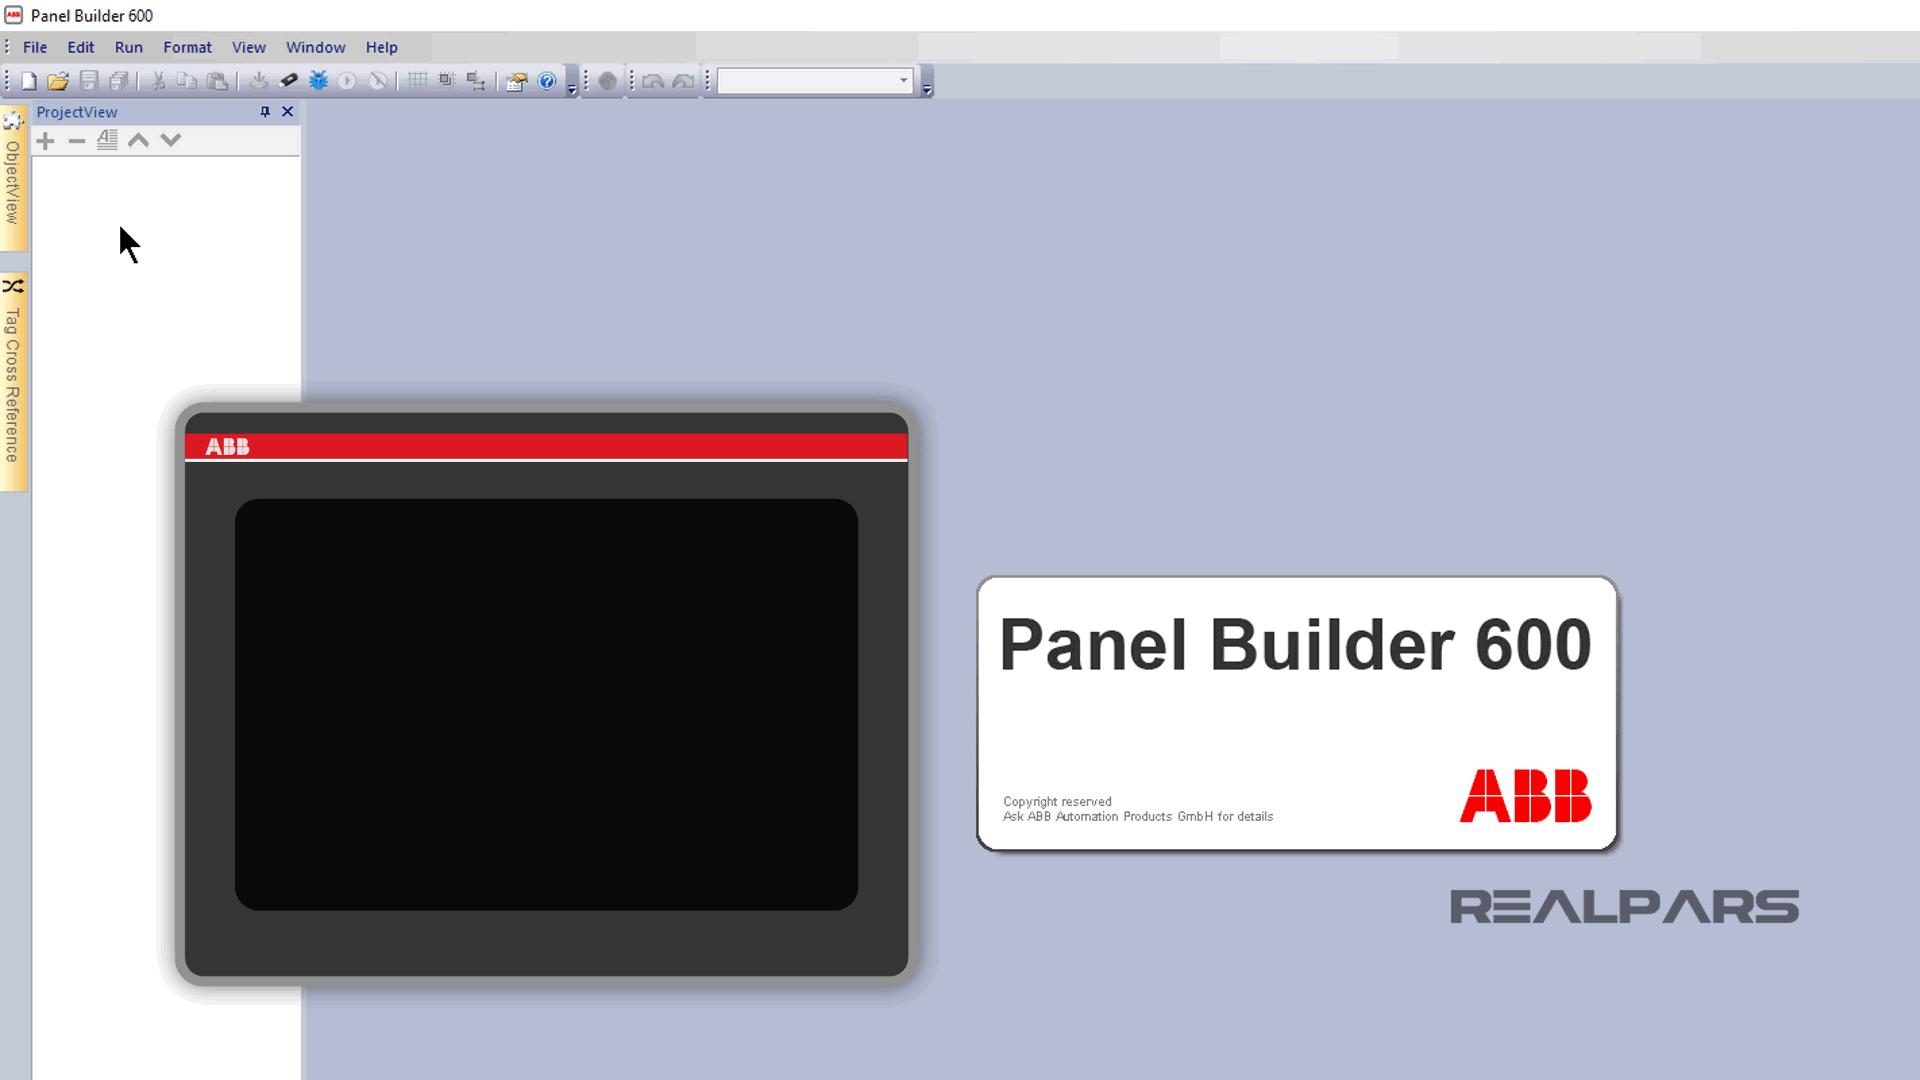 ABB Panel Builder 600